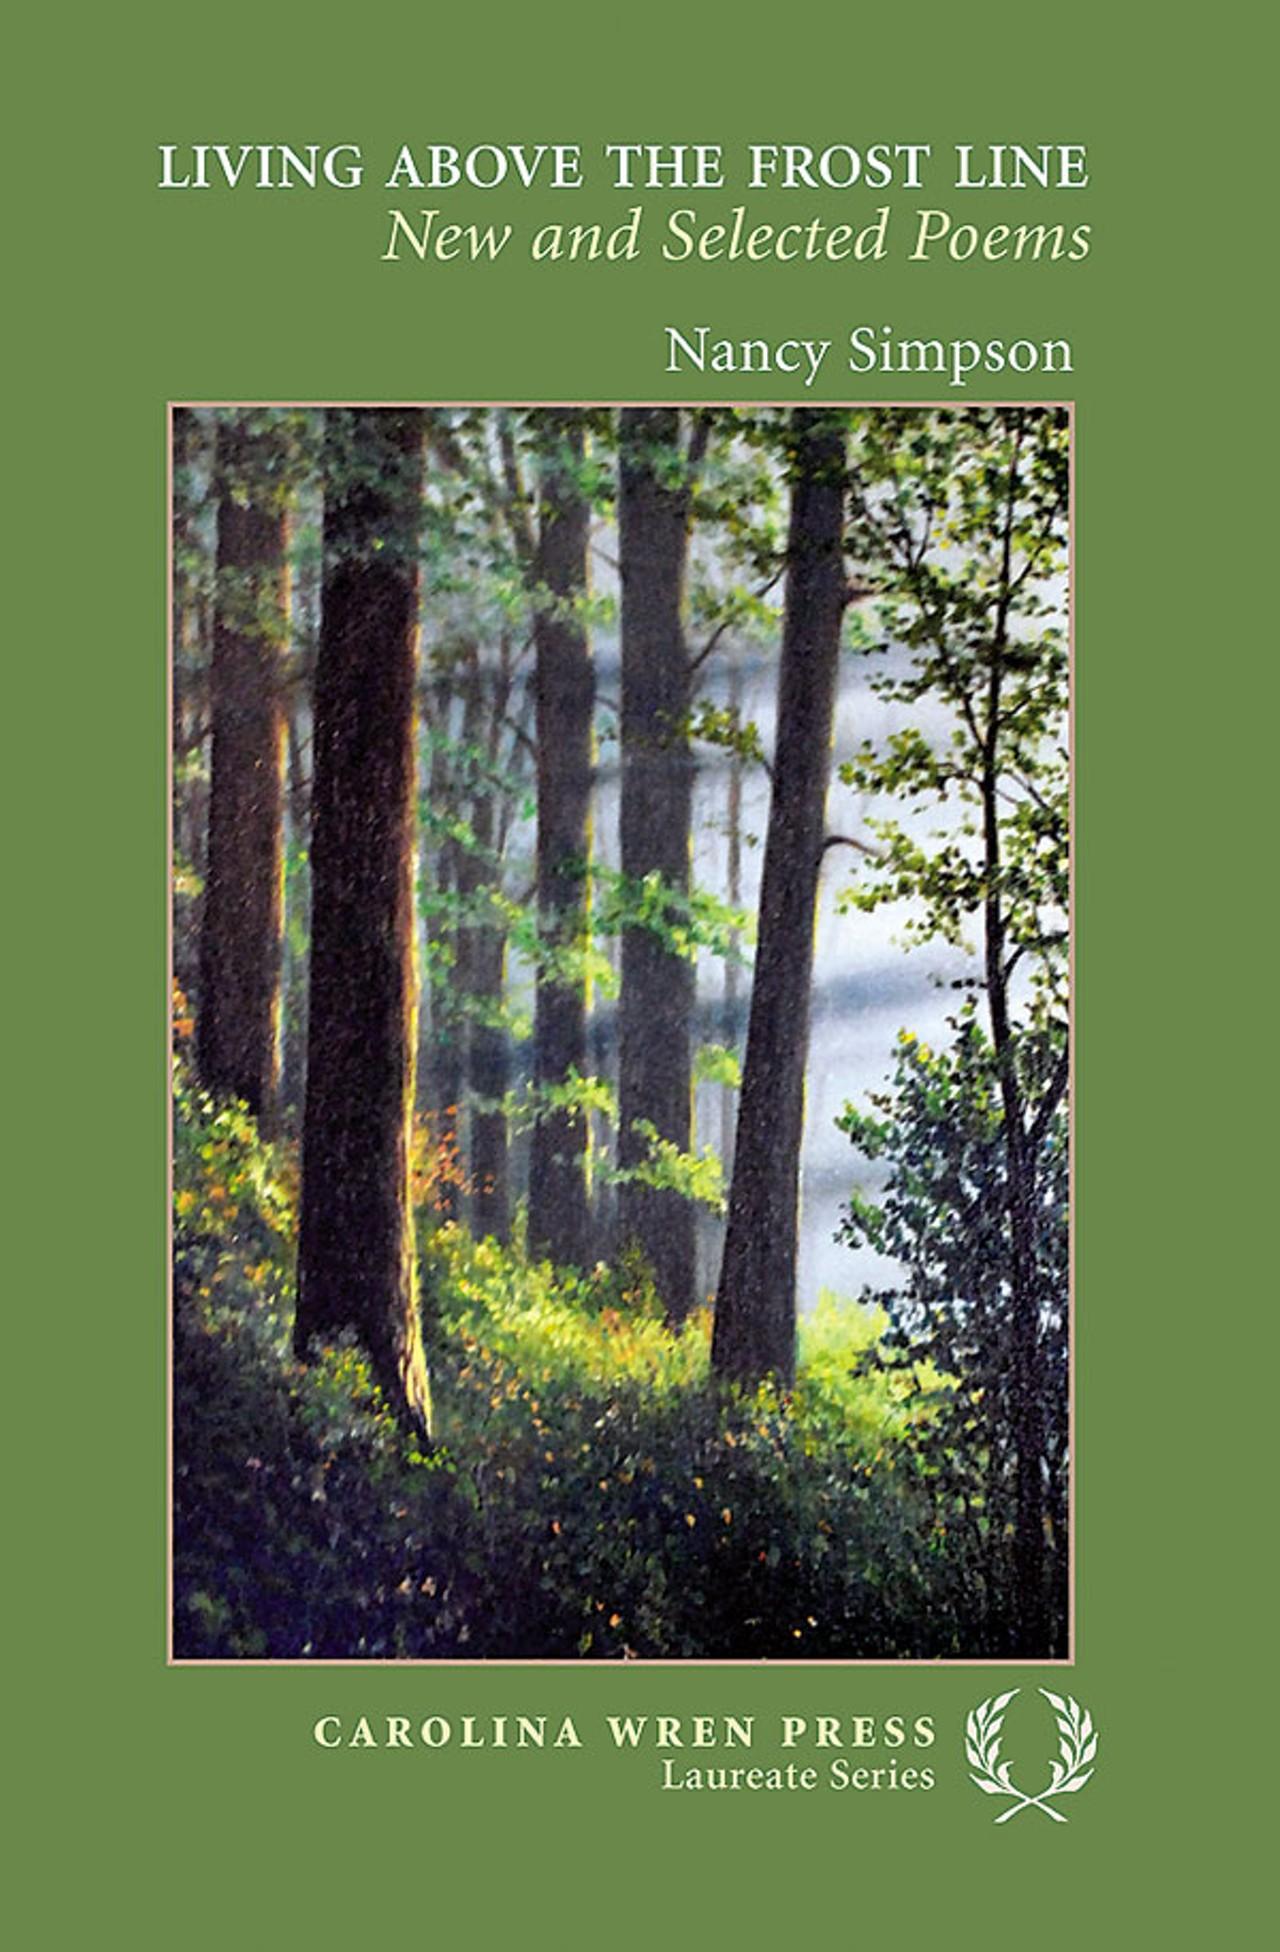 frostline-simpson_cover